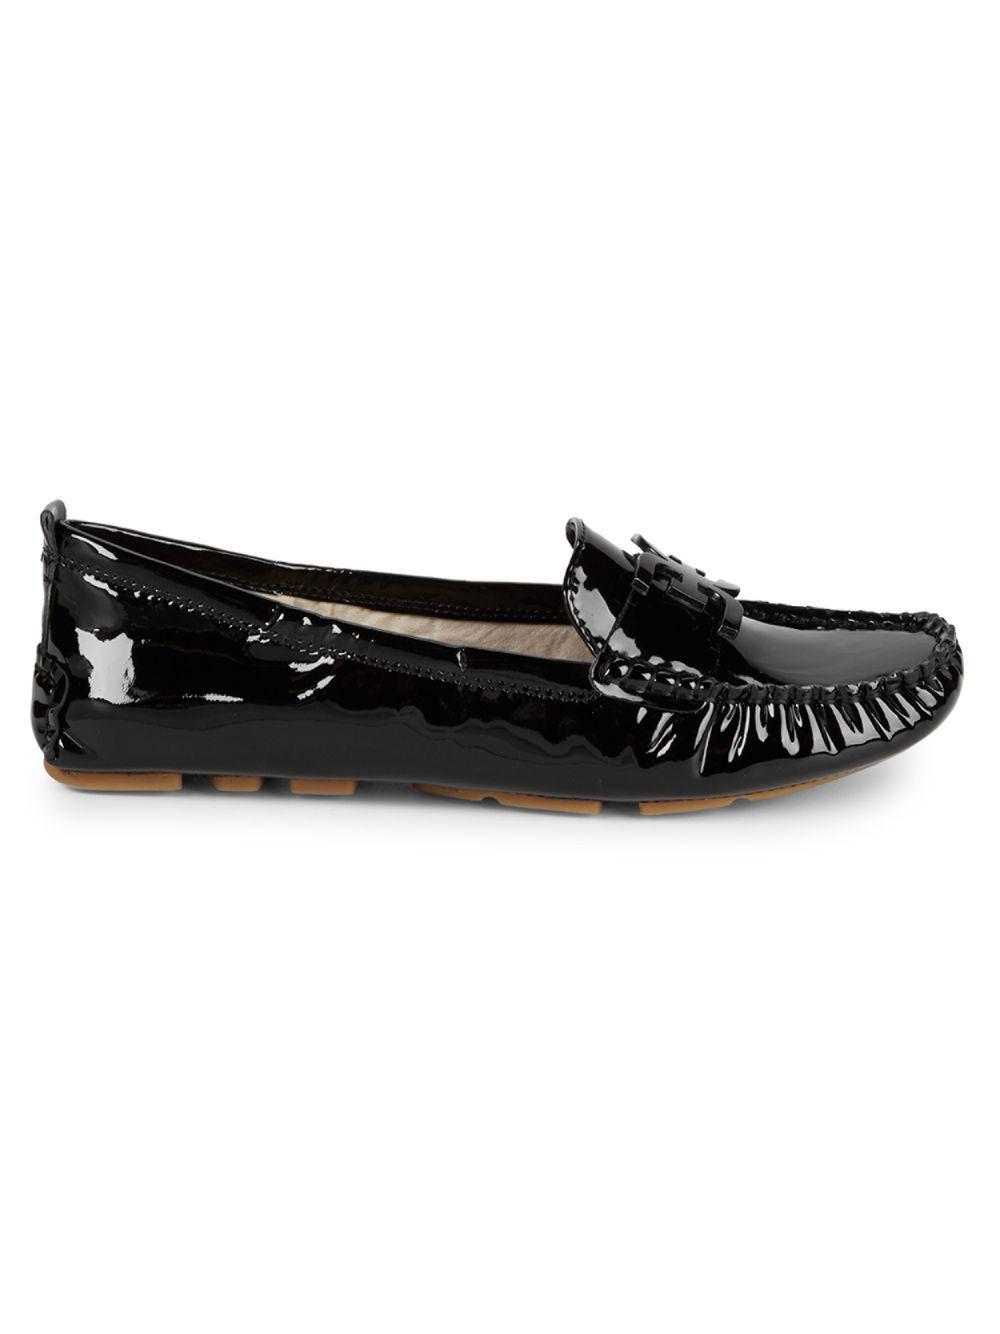 b1f254be197 Lyst - Sam Edelman Farrell Loafers in Black